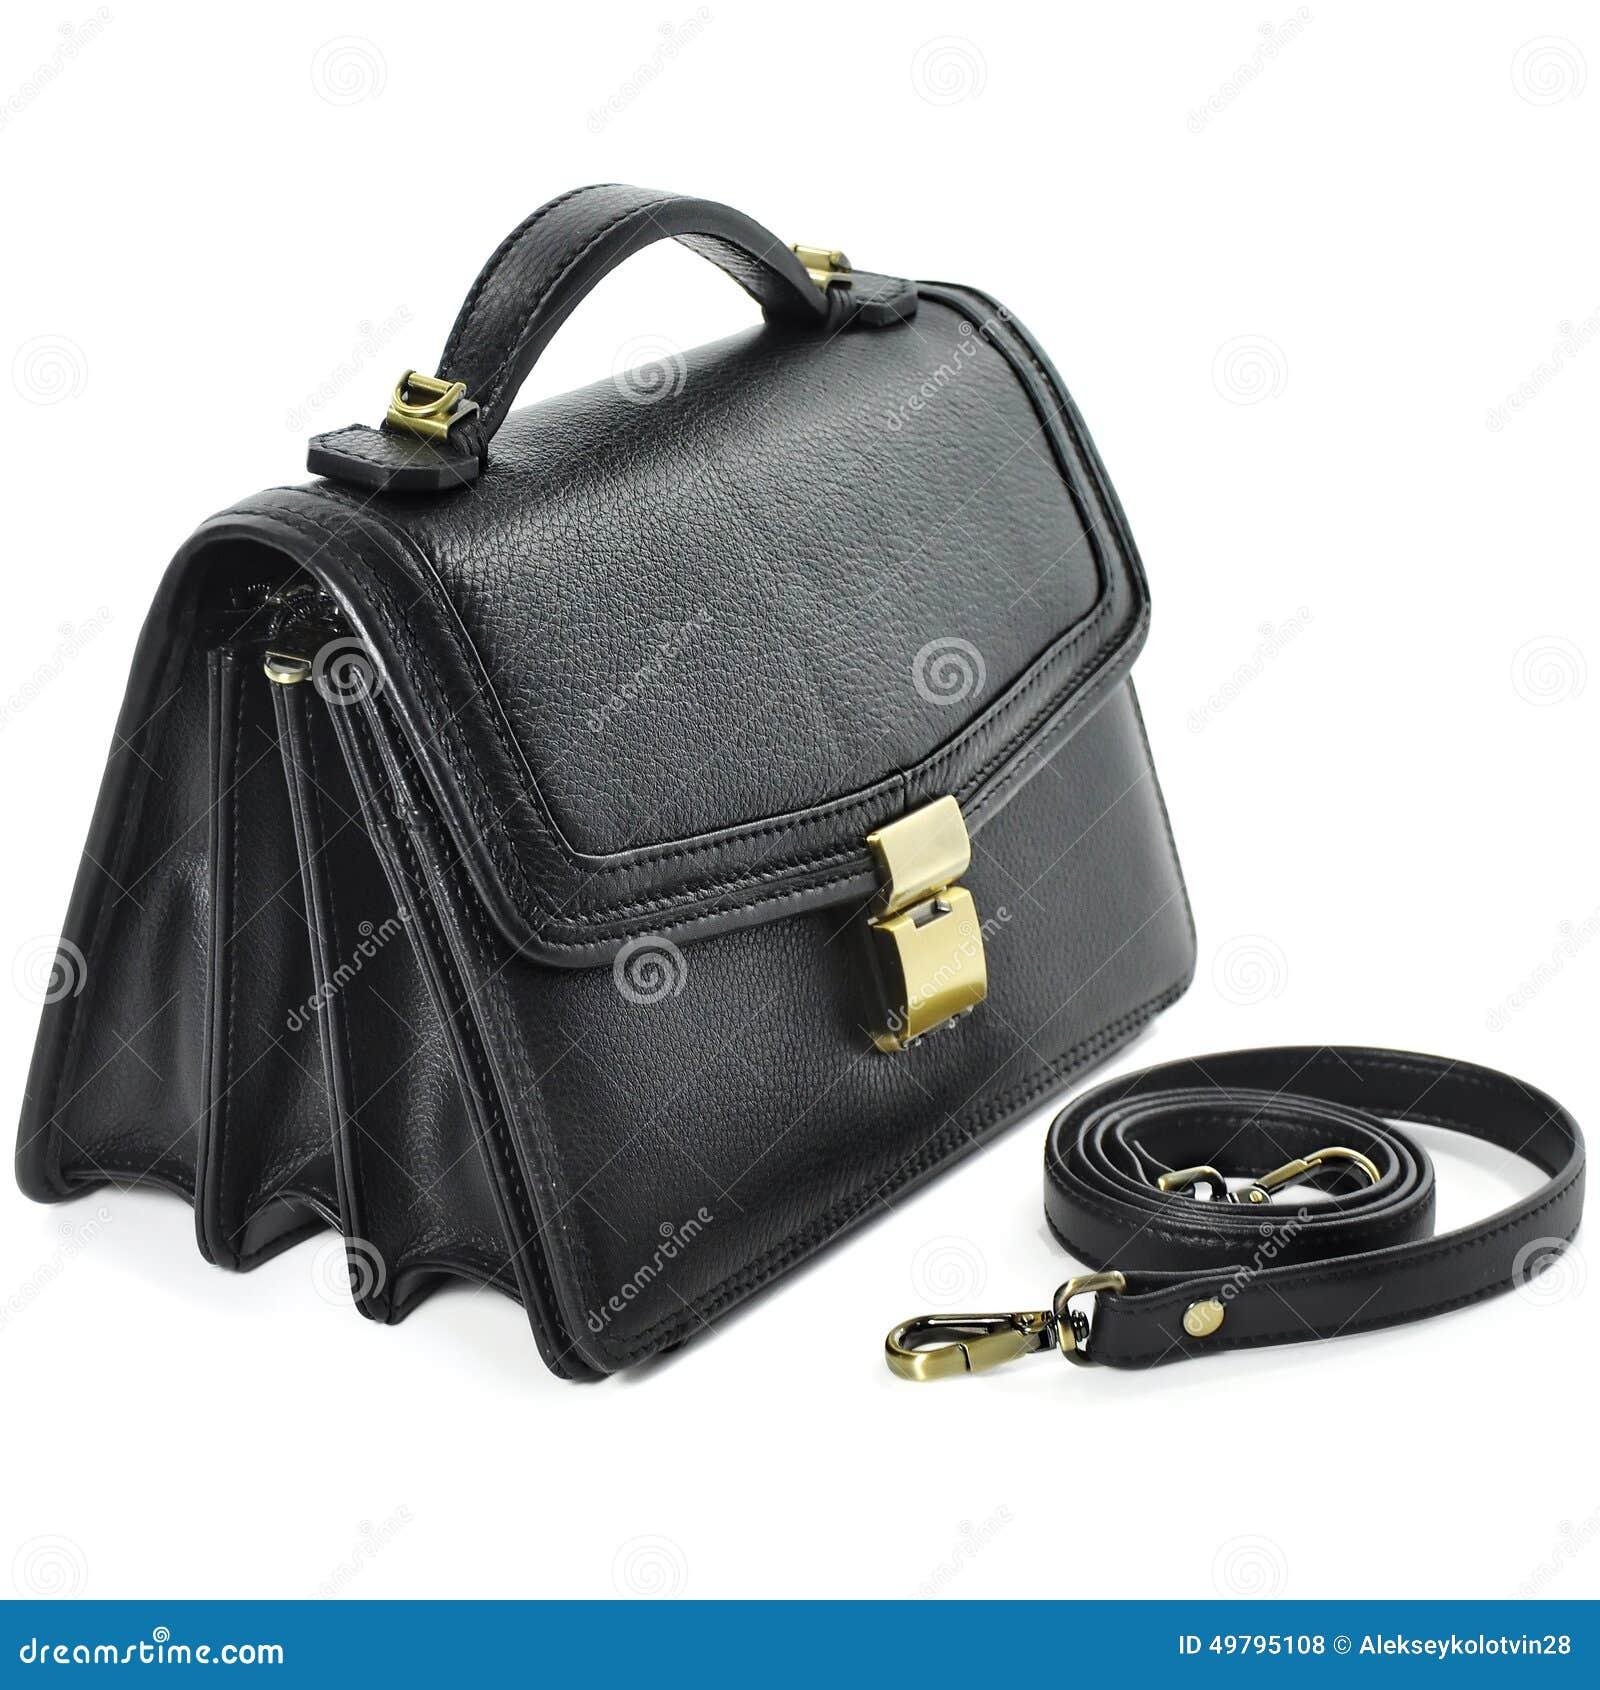 2ba5f6787d Ανθρώπινη μικρή μαύρη τσάντα δέρματος στο άσπρο υπόβαθρο Στοκ ...